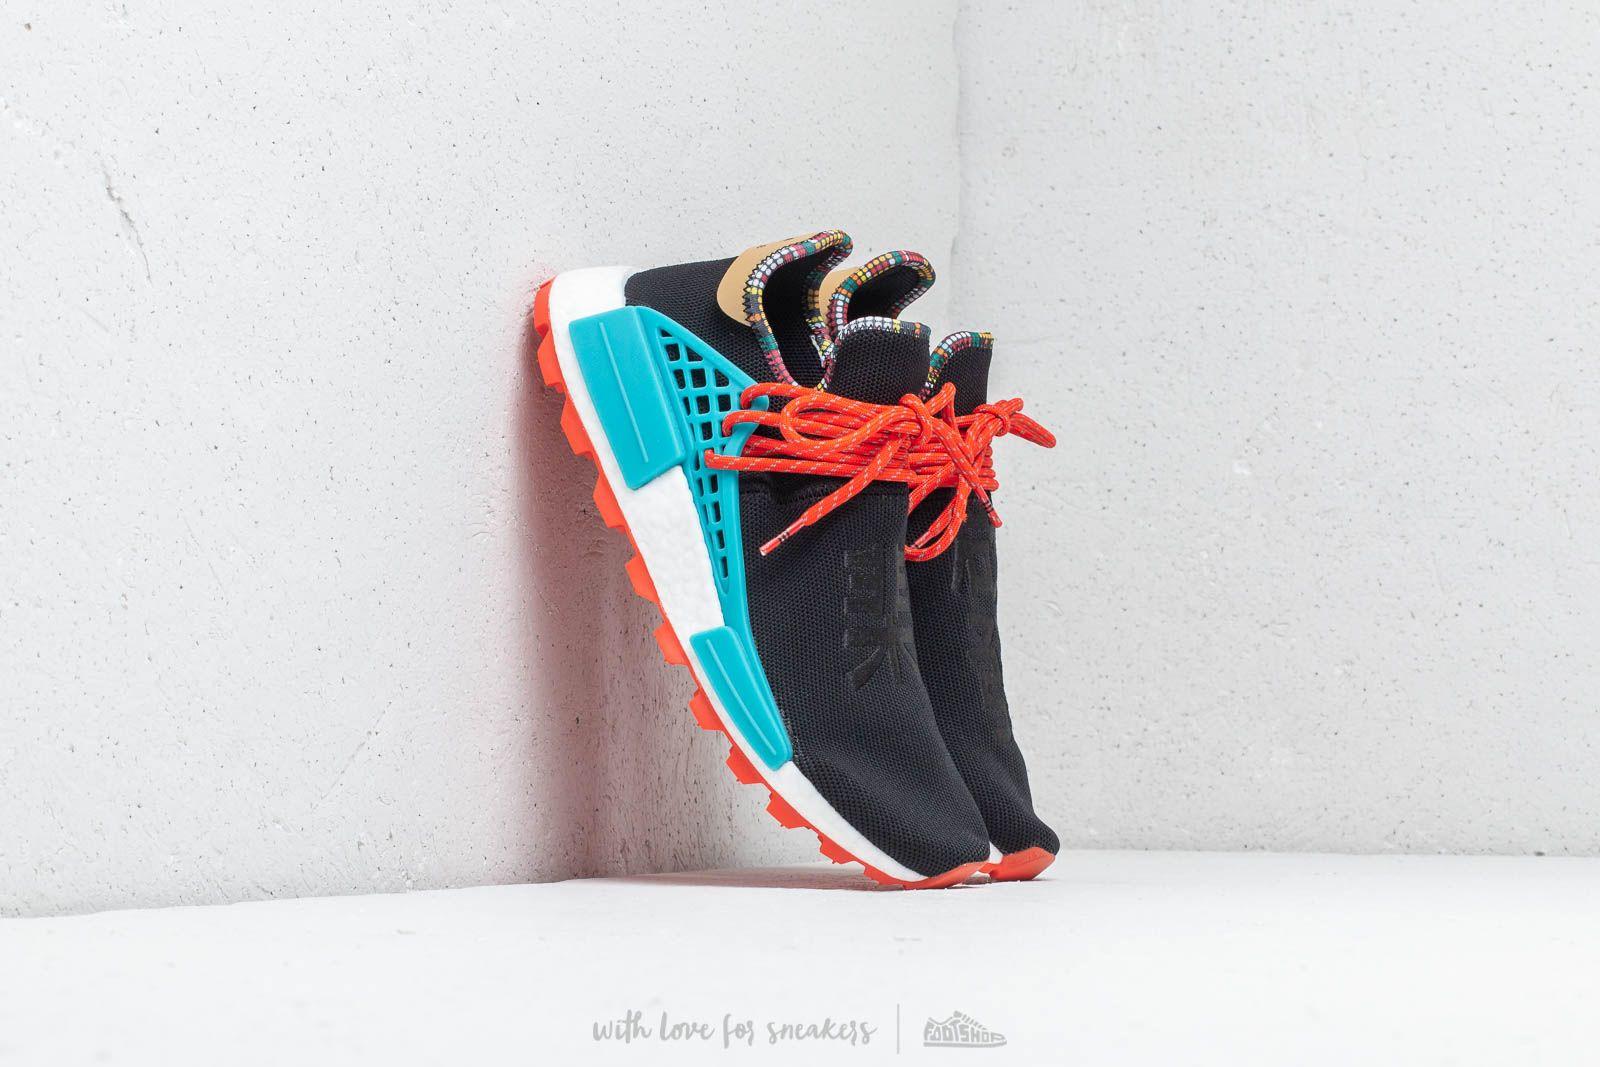 cbcda2a71a907 adidas x Pharrell Williams